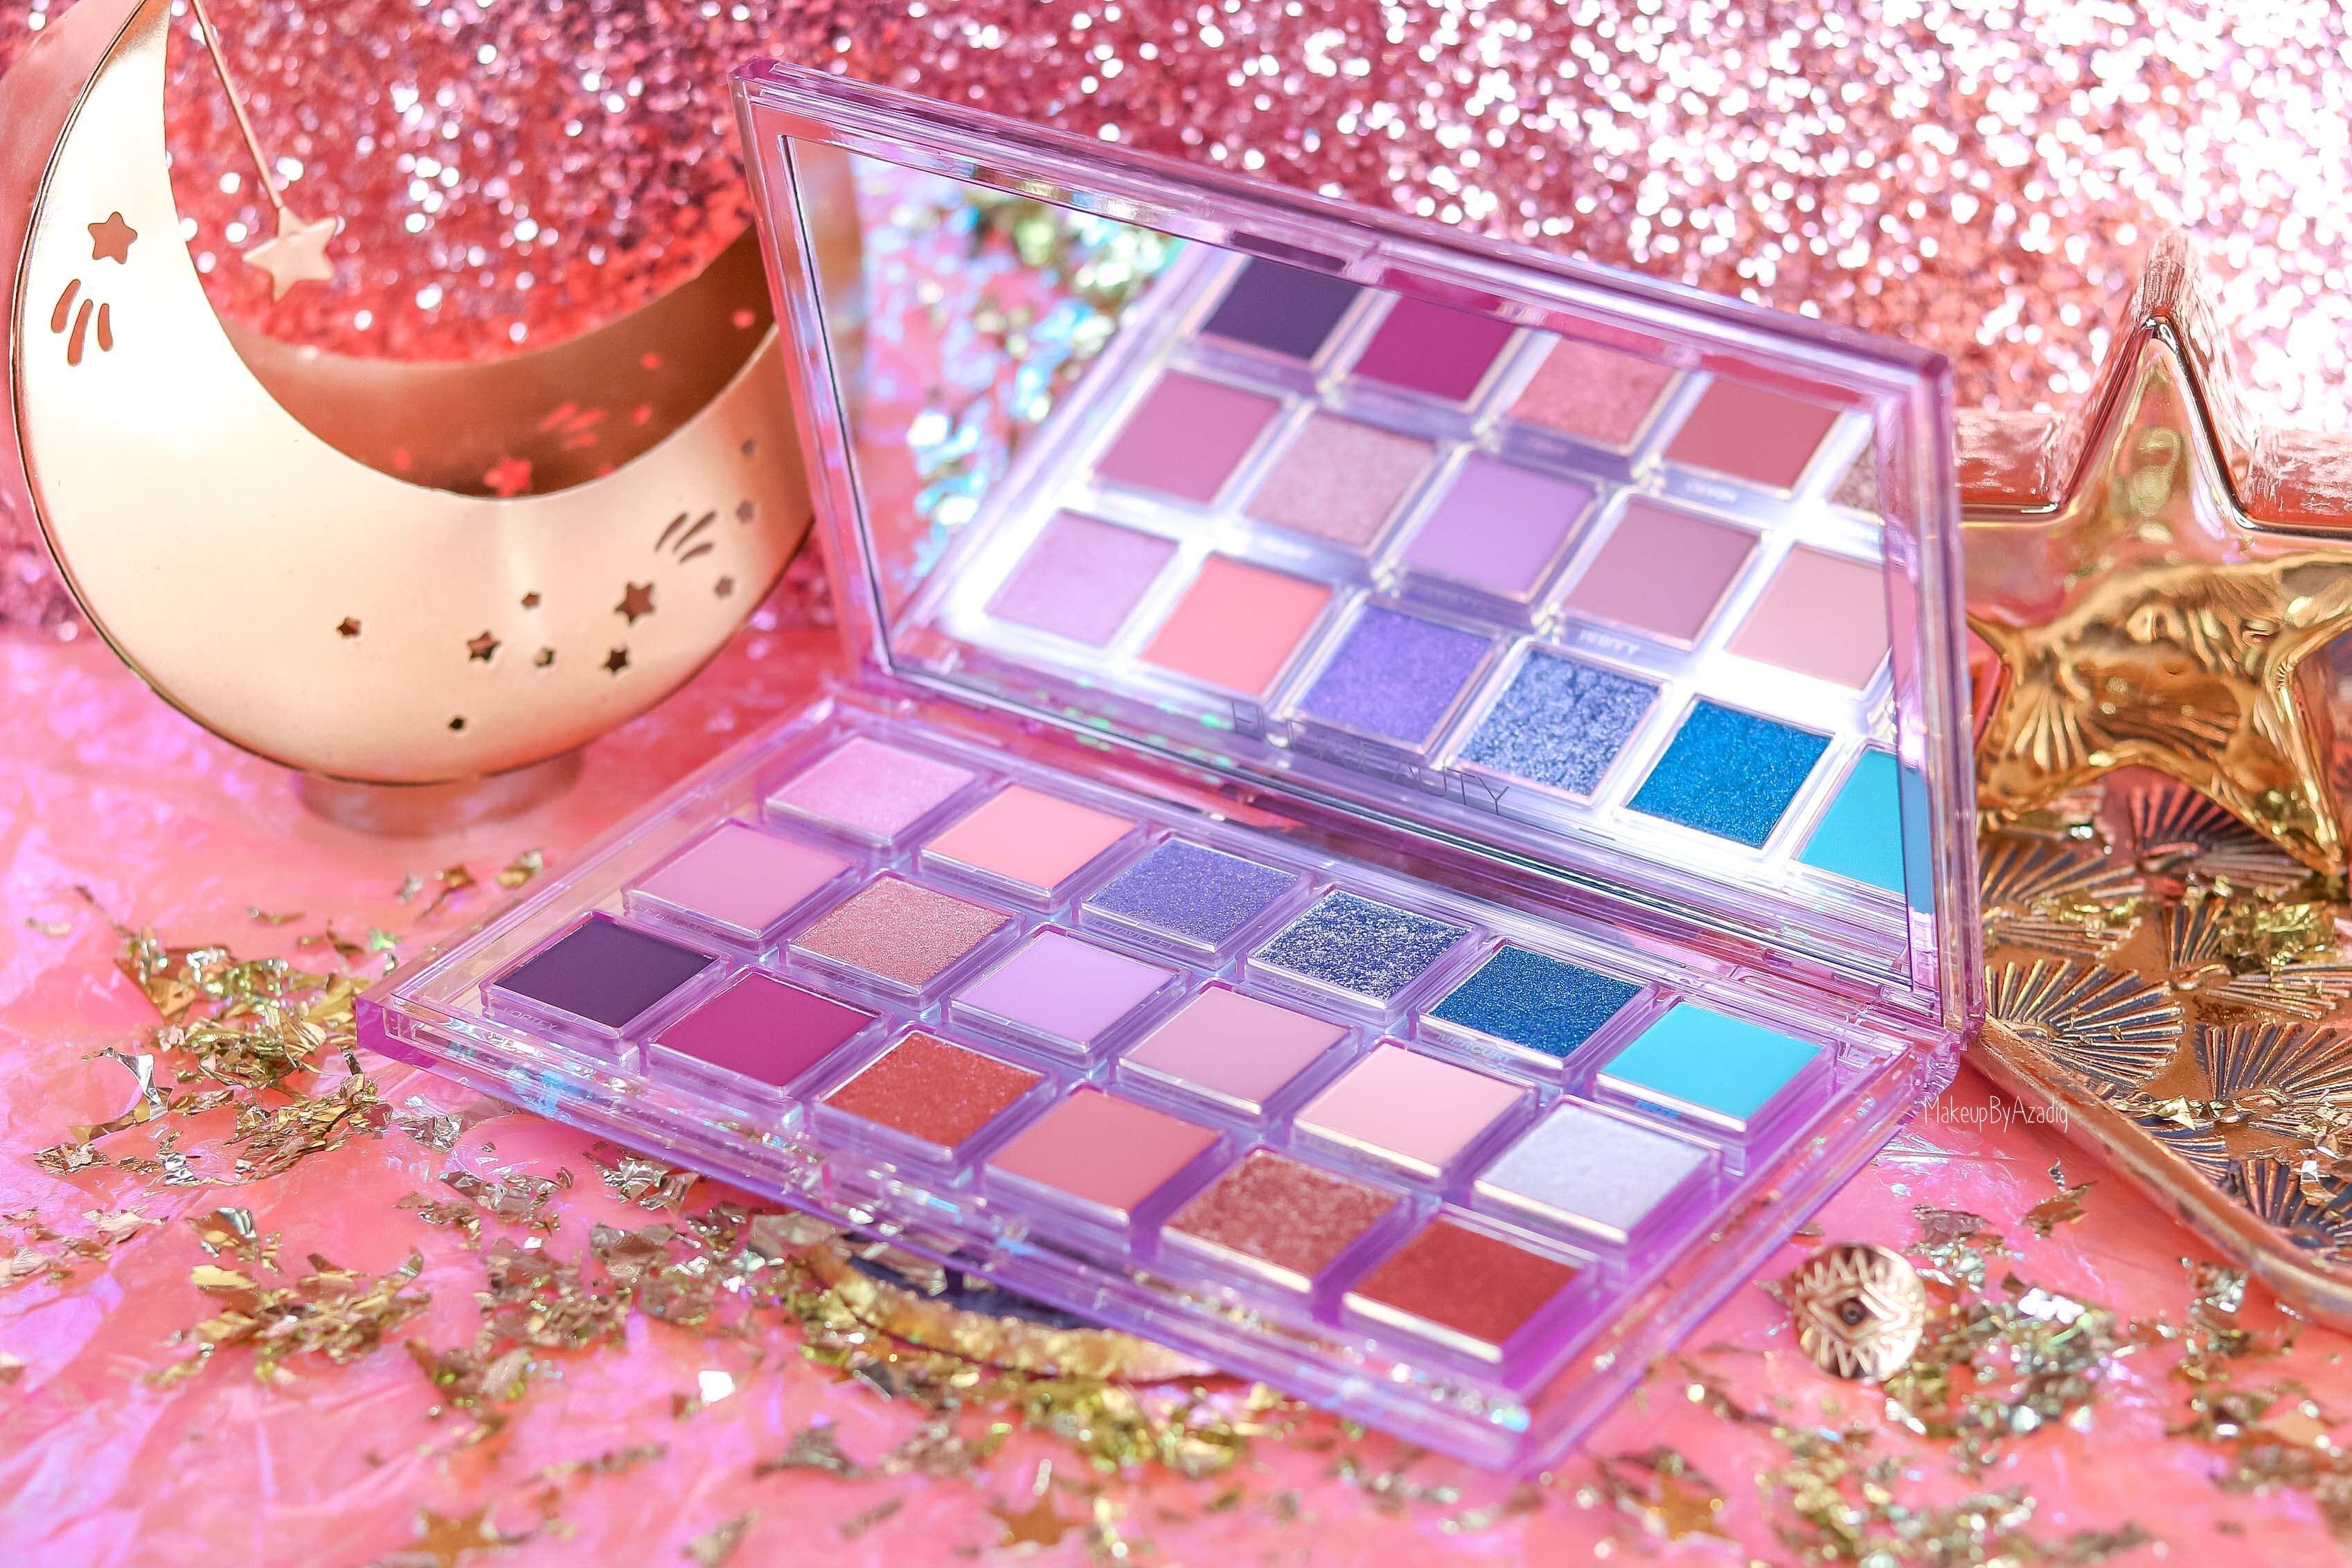 revue-palette-mercury-retrograde-huda-beauty-sephora-france-makeupbyazadig-avis-prix-swatch-astrologie-miniature